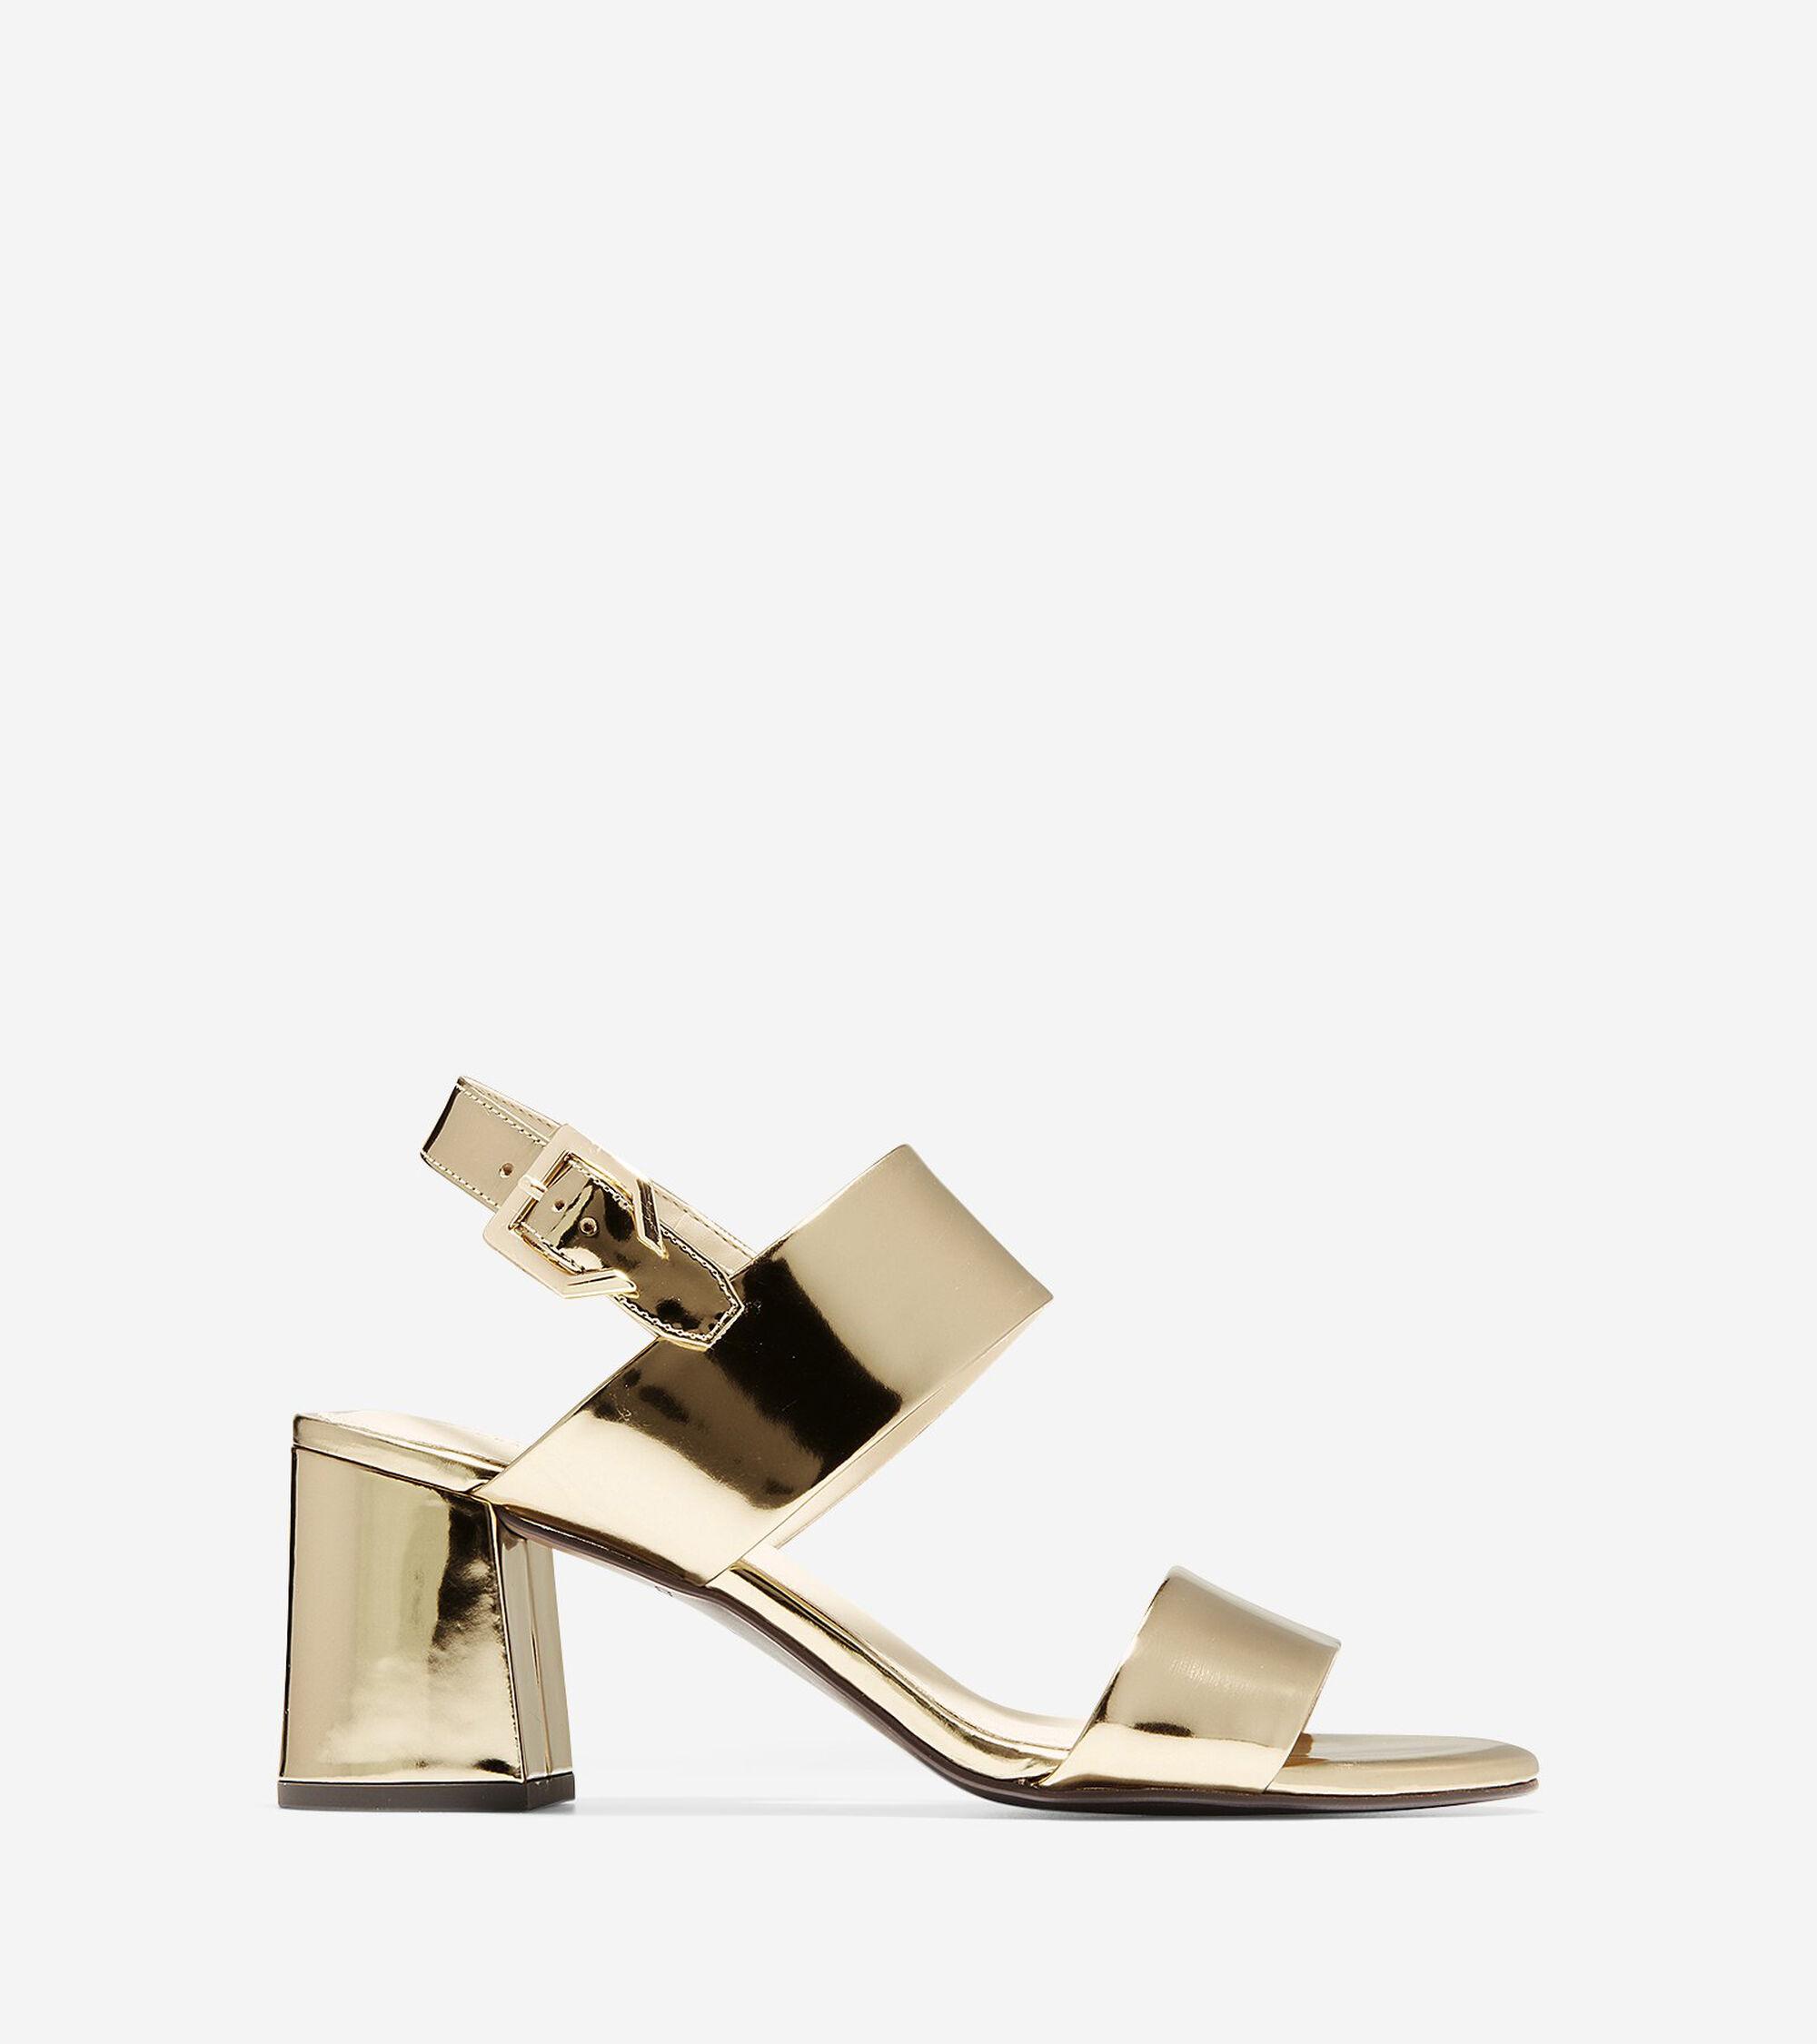 5ca9f82635c Women s Avani City Sandals 65mm in Gold